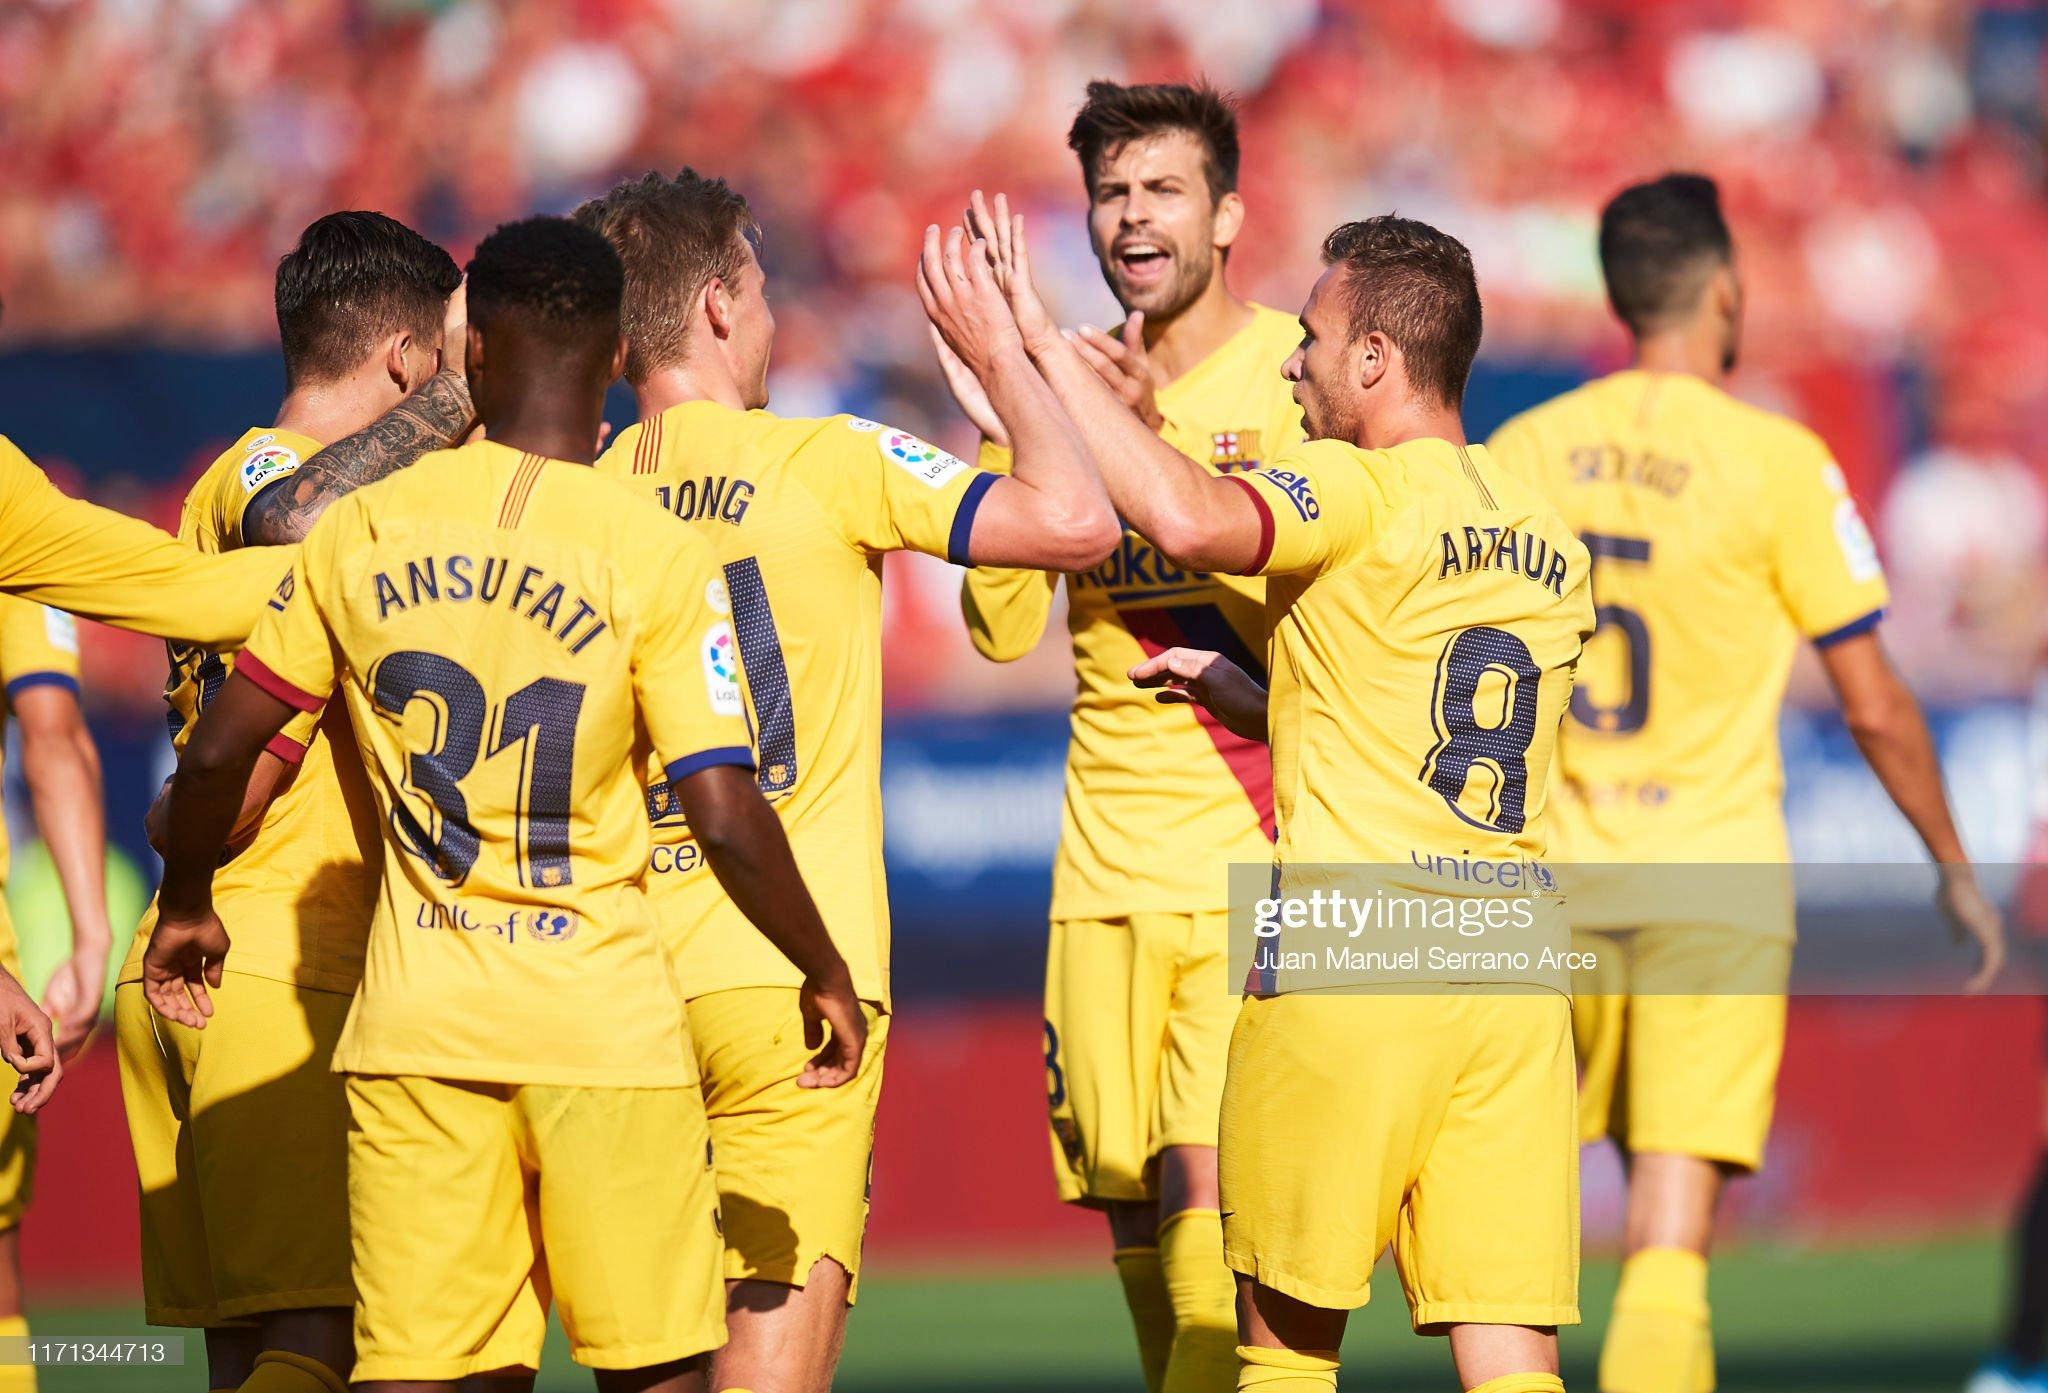 صور مباراة : أوساسونا - برشلونة 2-2 ( 31-08-2019 )  Arthur-melo-of-fc-barcelona-celebrates-after-scoring-his-teams-second-picture-id1171344713?s=2048x2048